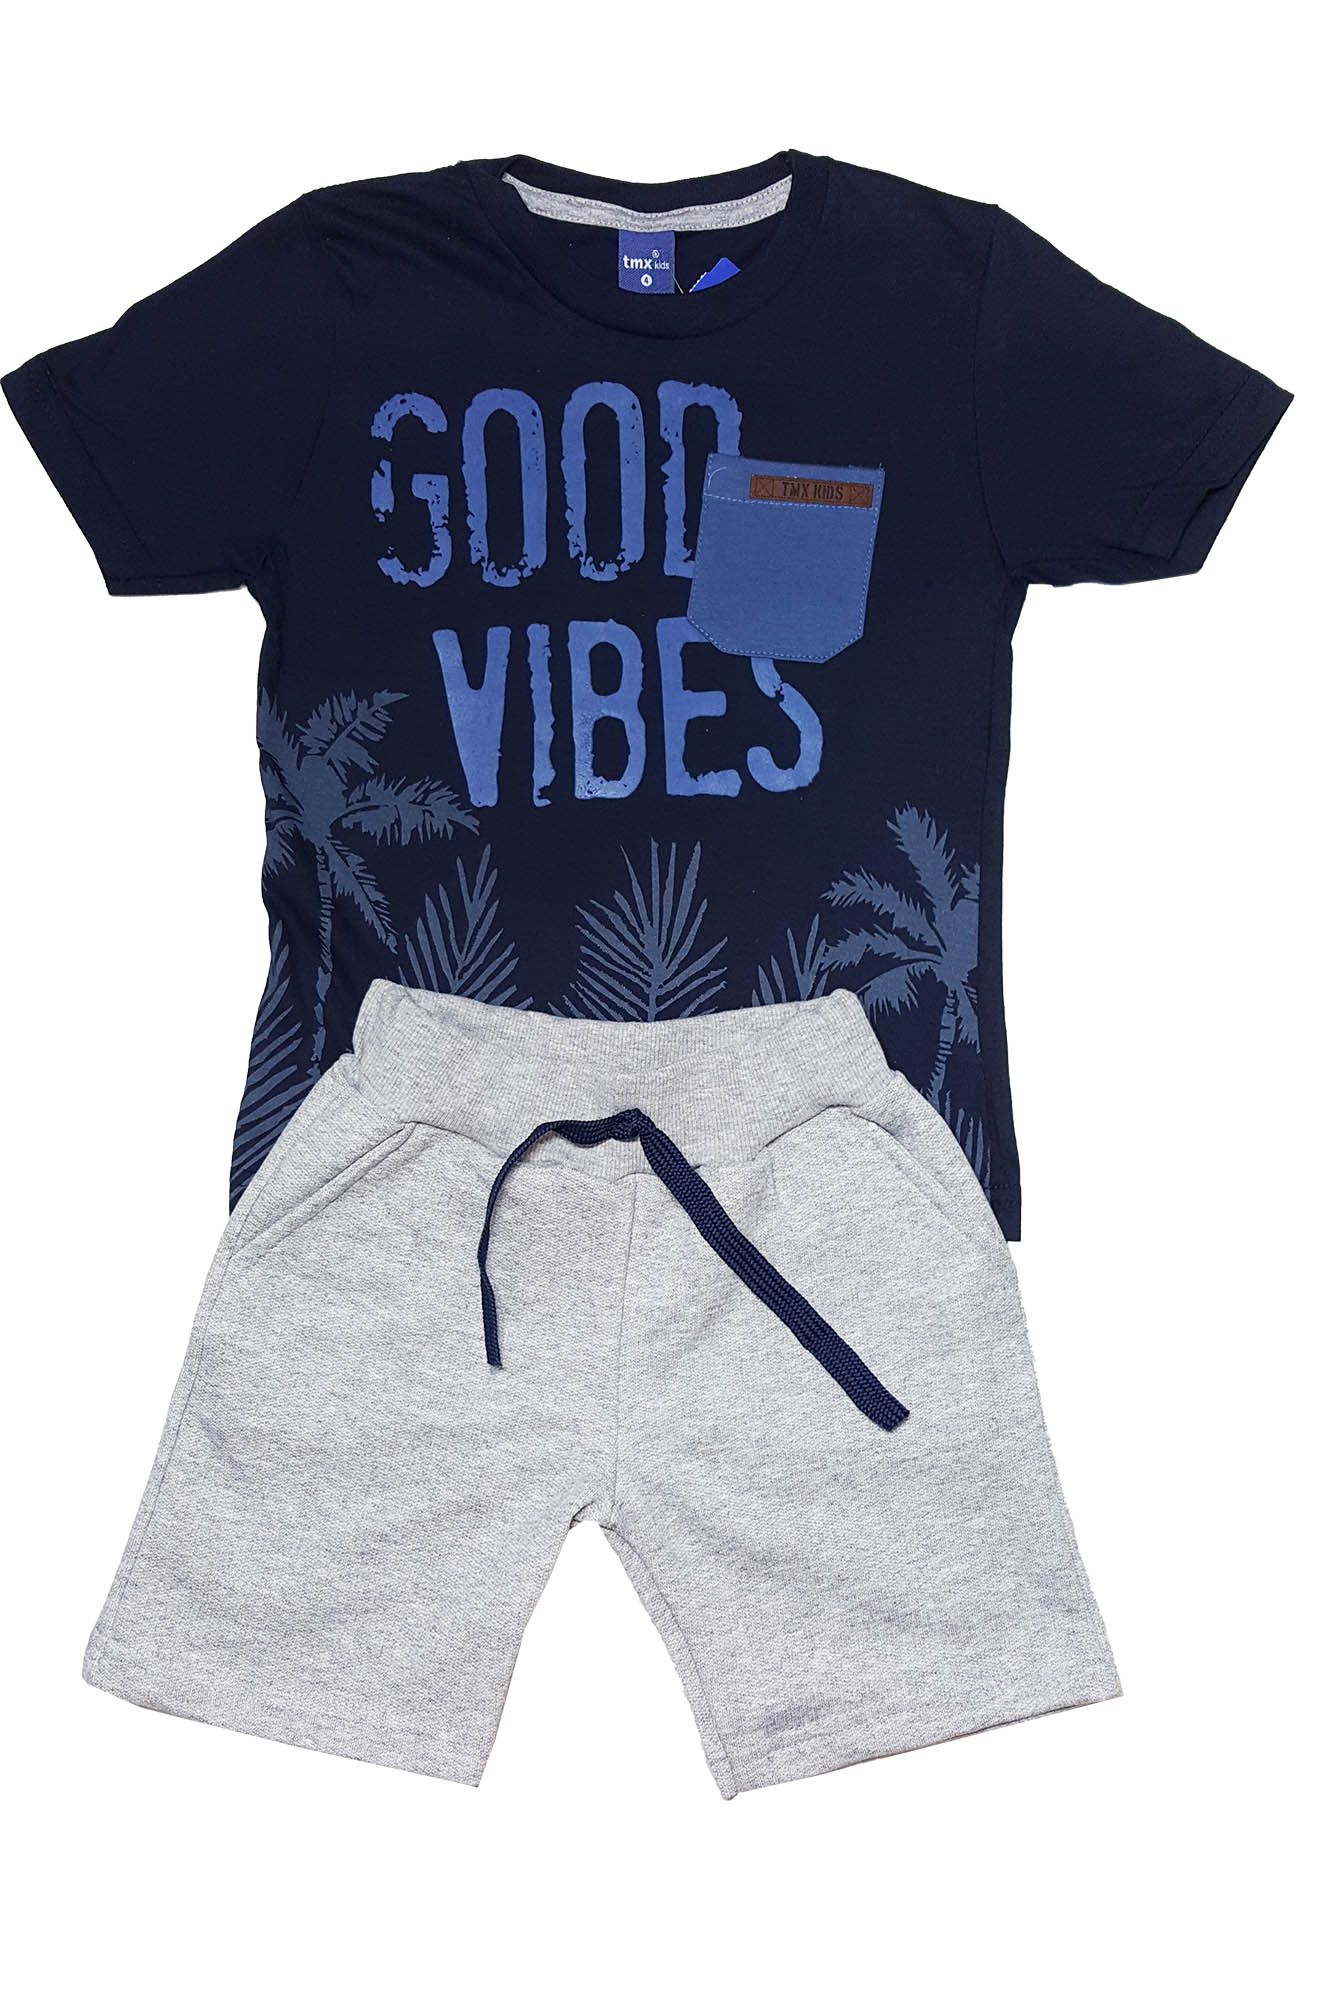 Conjunto Camiseta e Bermuda Moletom  TMX  Good Vives Marinho /Mescla